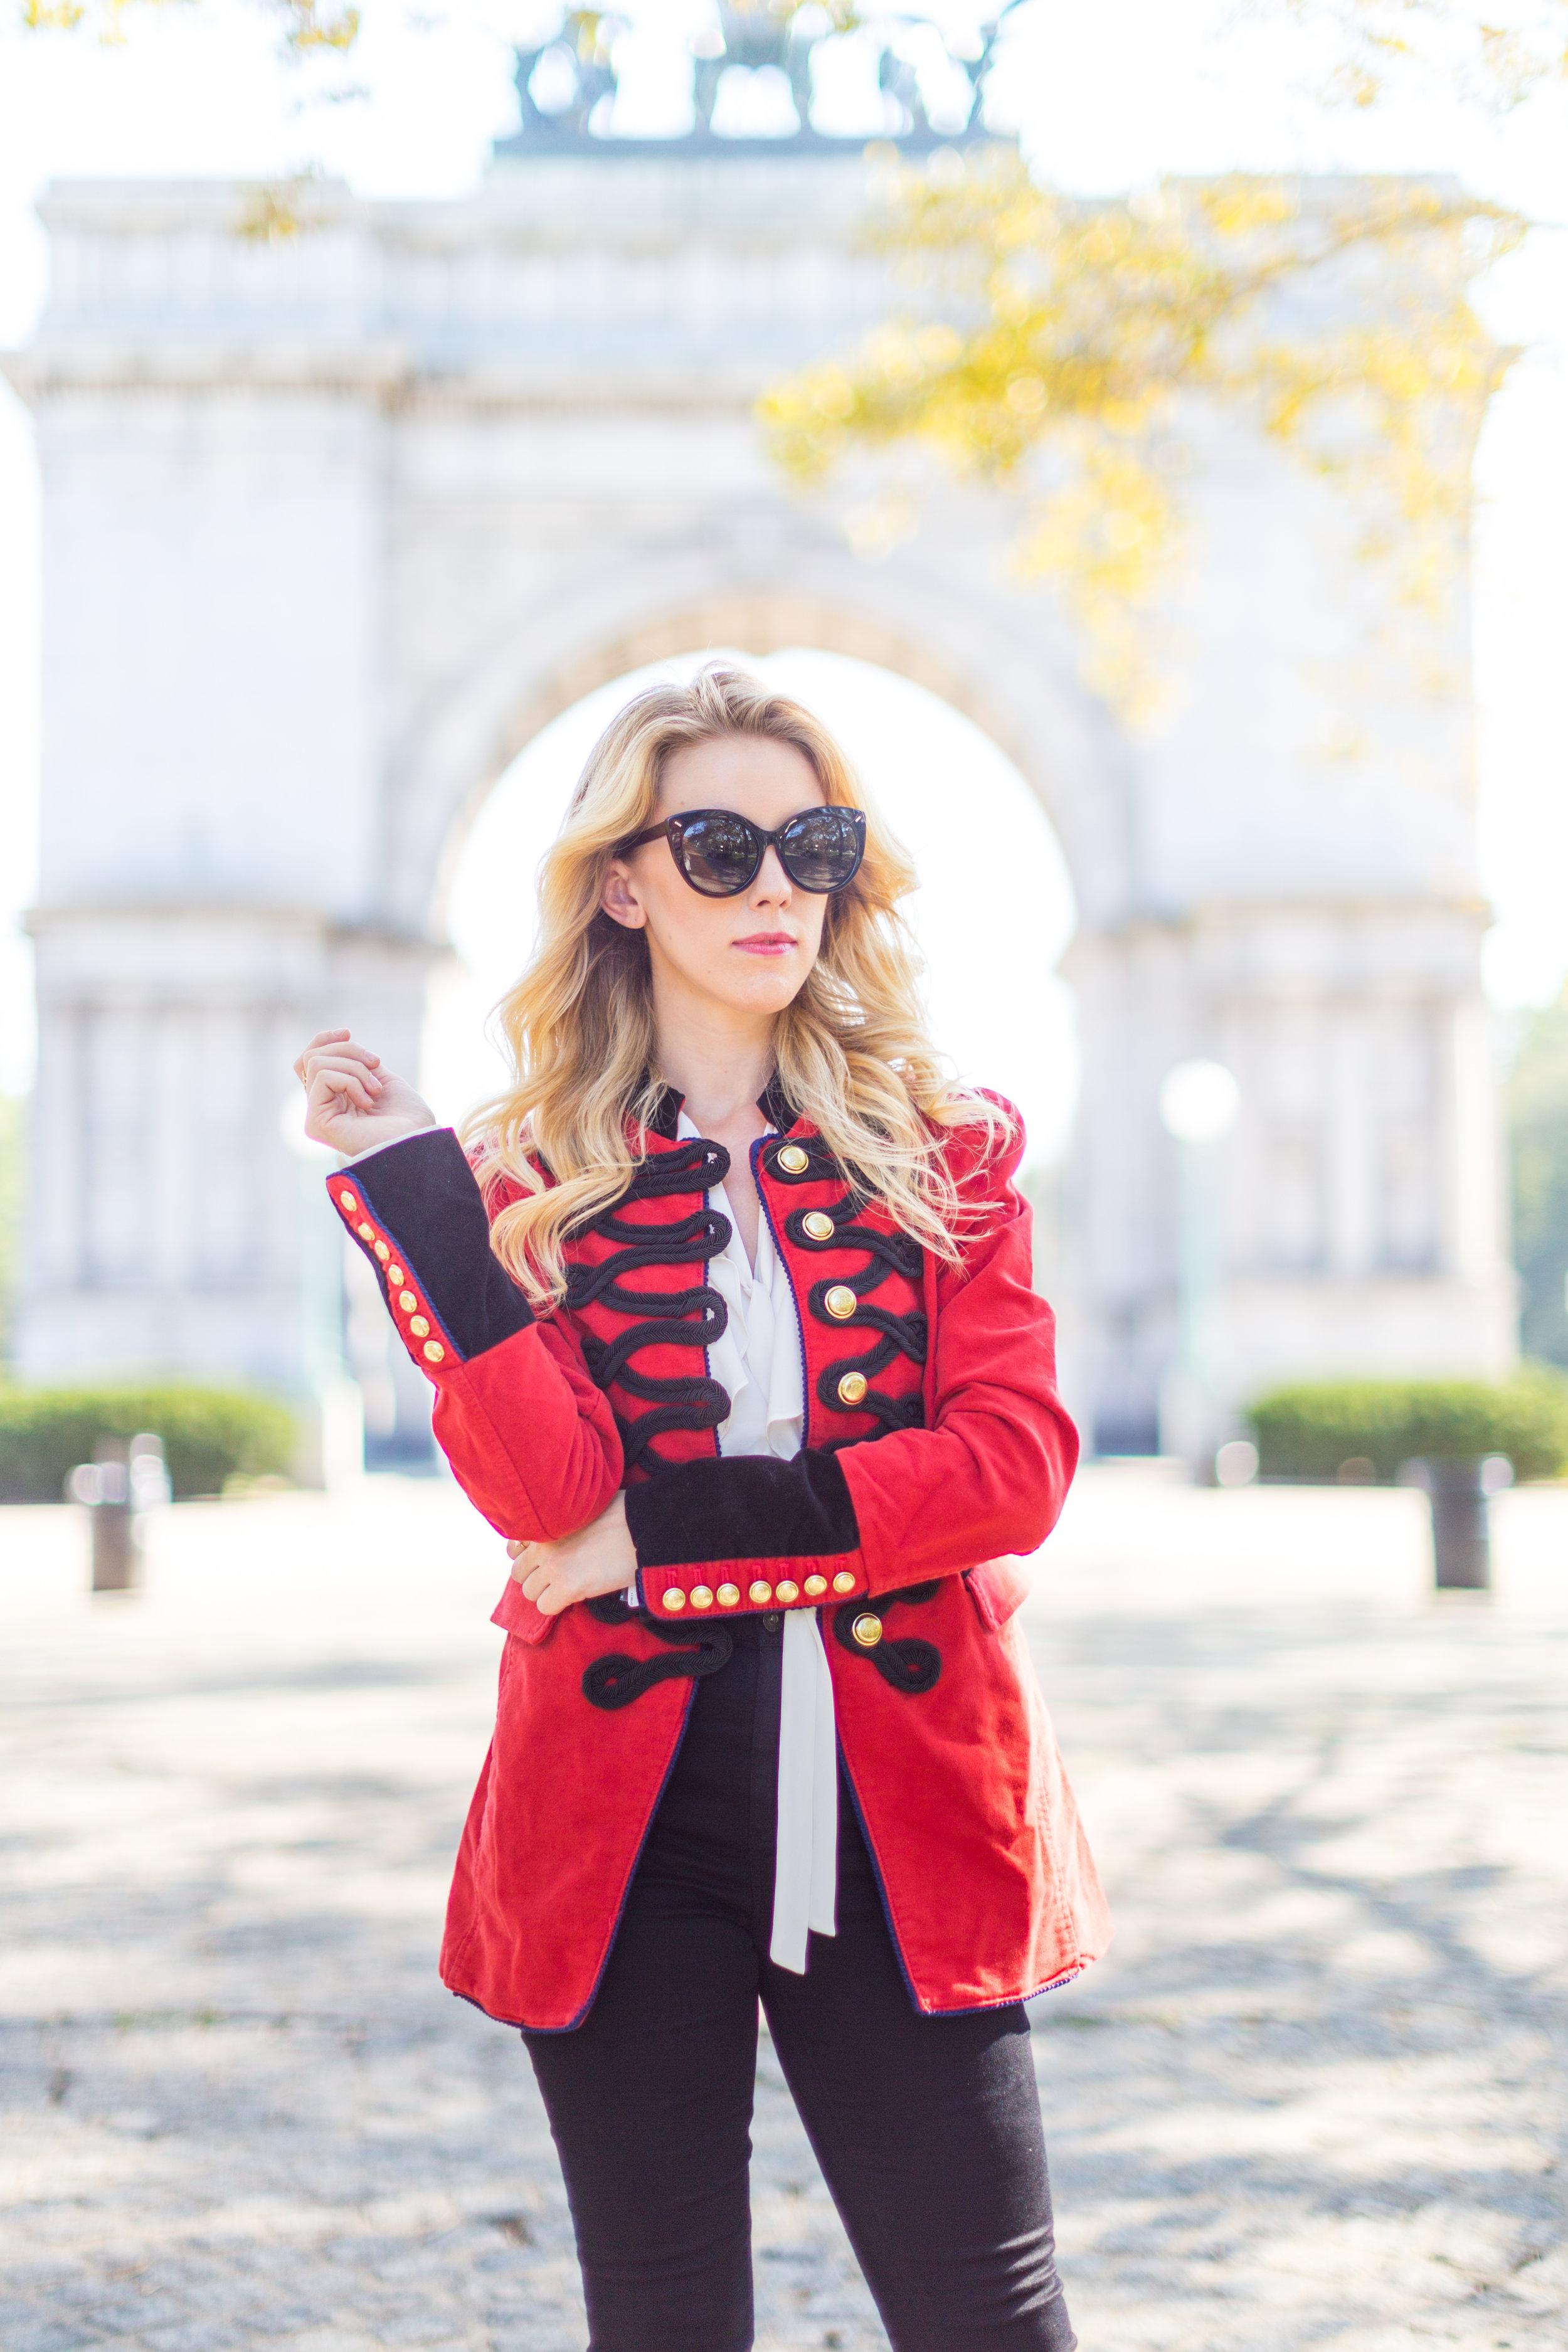 Fall Fashion Red Band Jacket Trendy-9.jpg